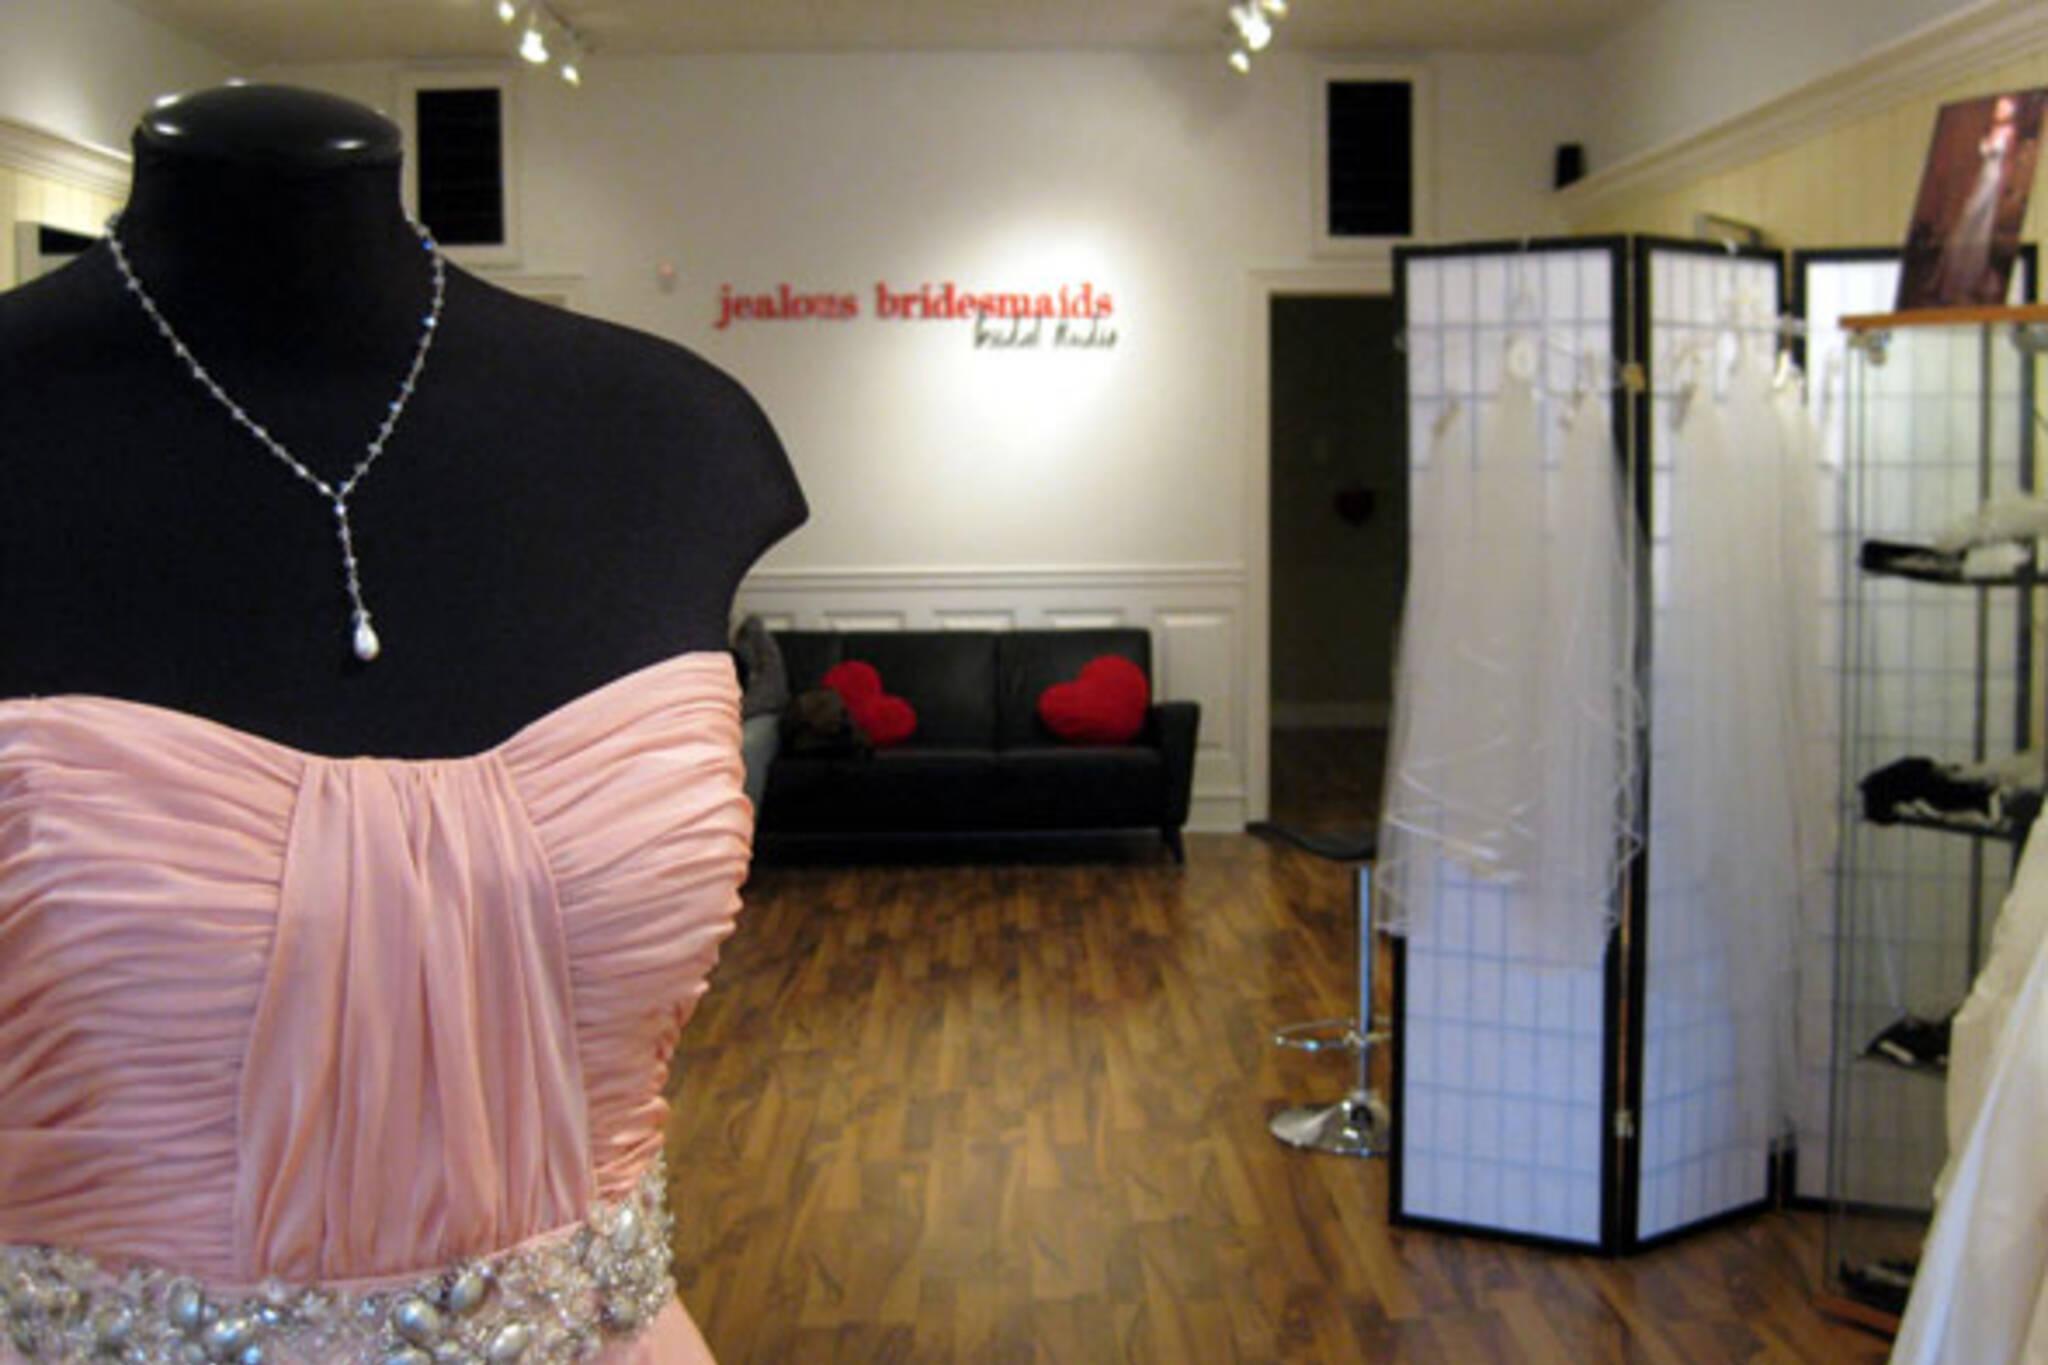 Jealous Bridesmaids Bridal Studio